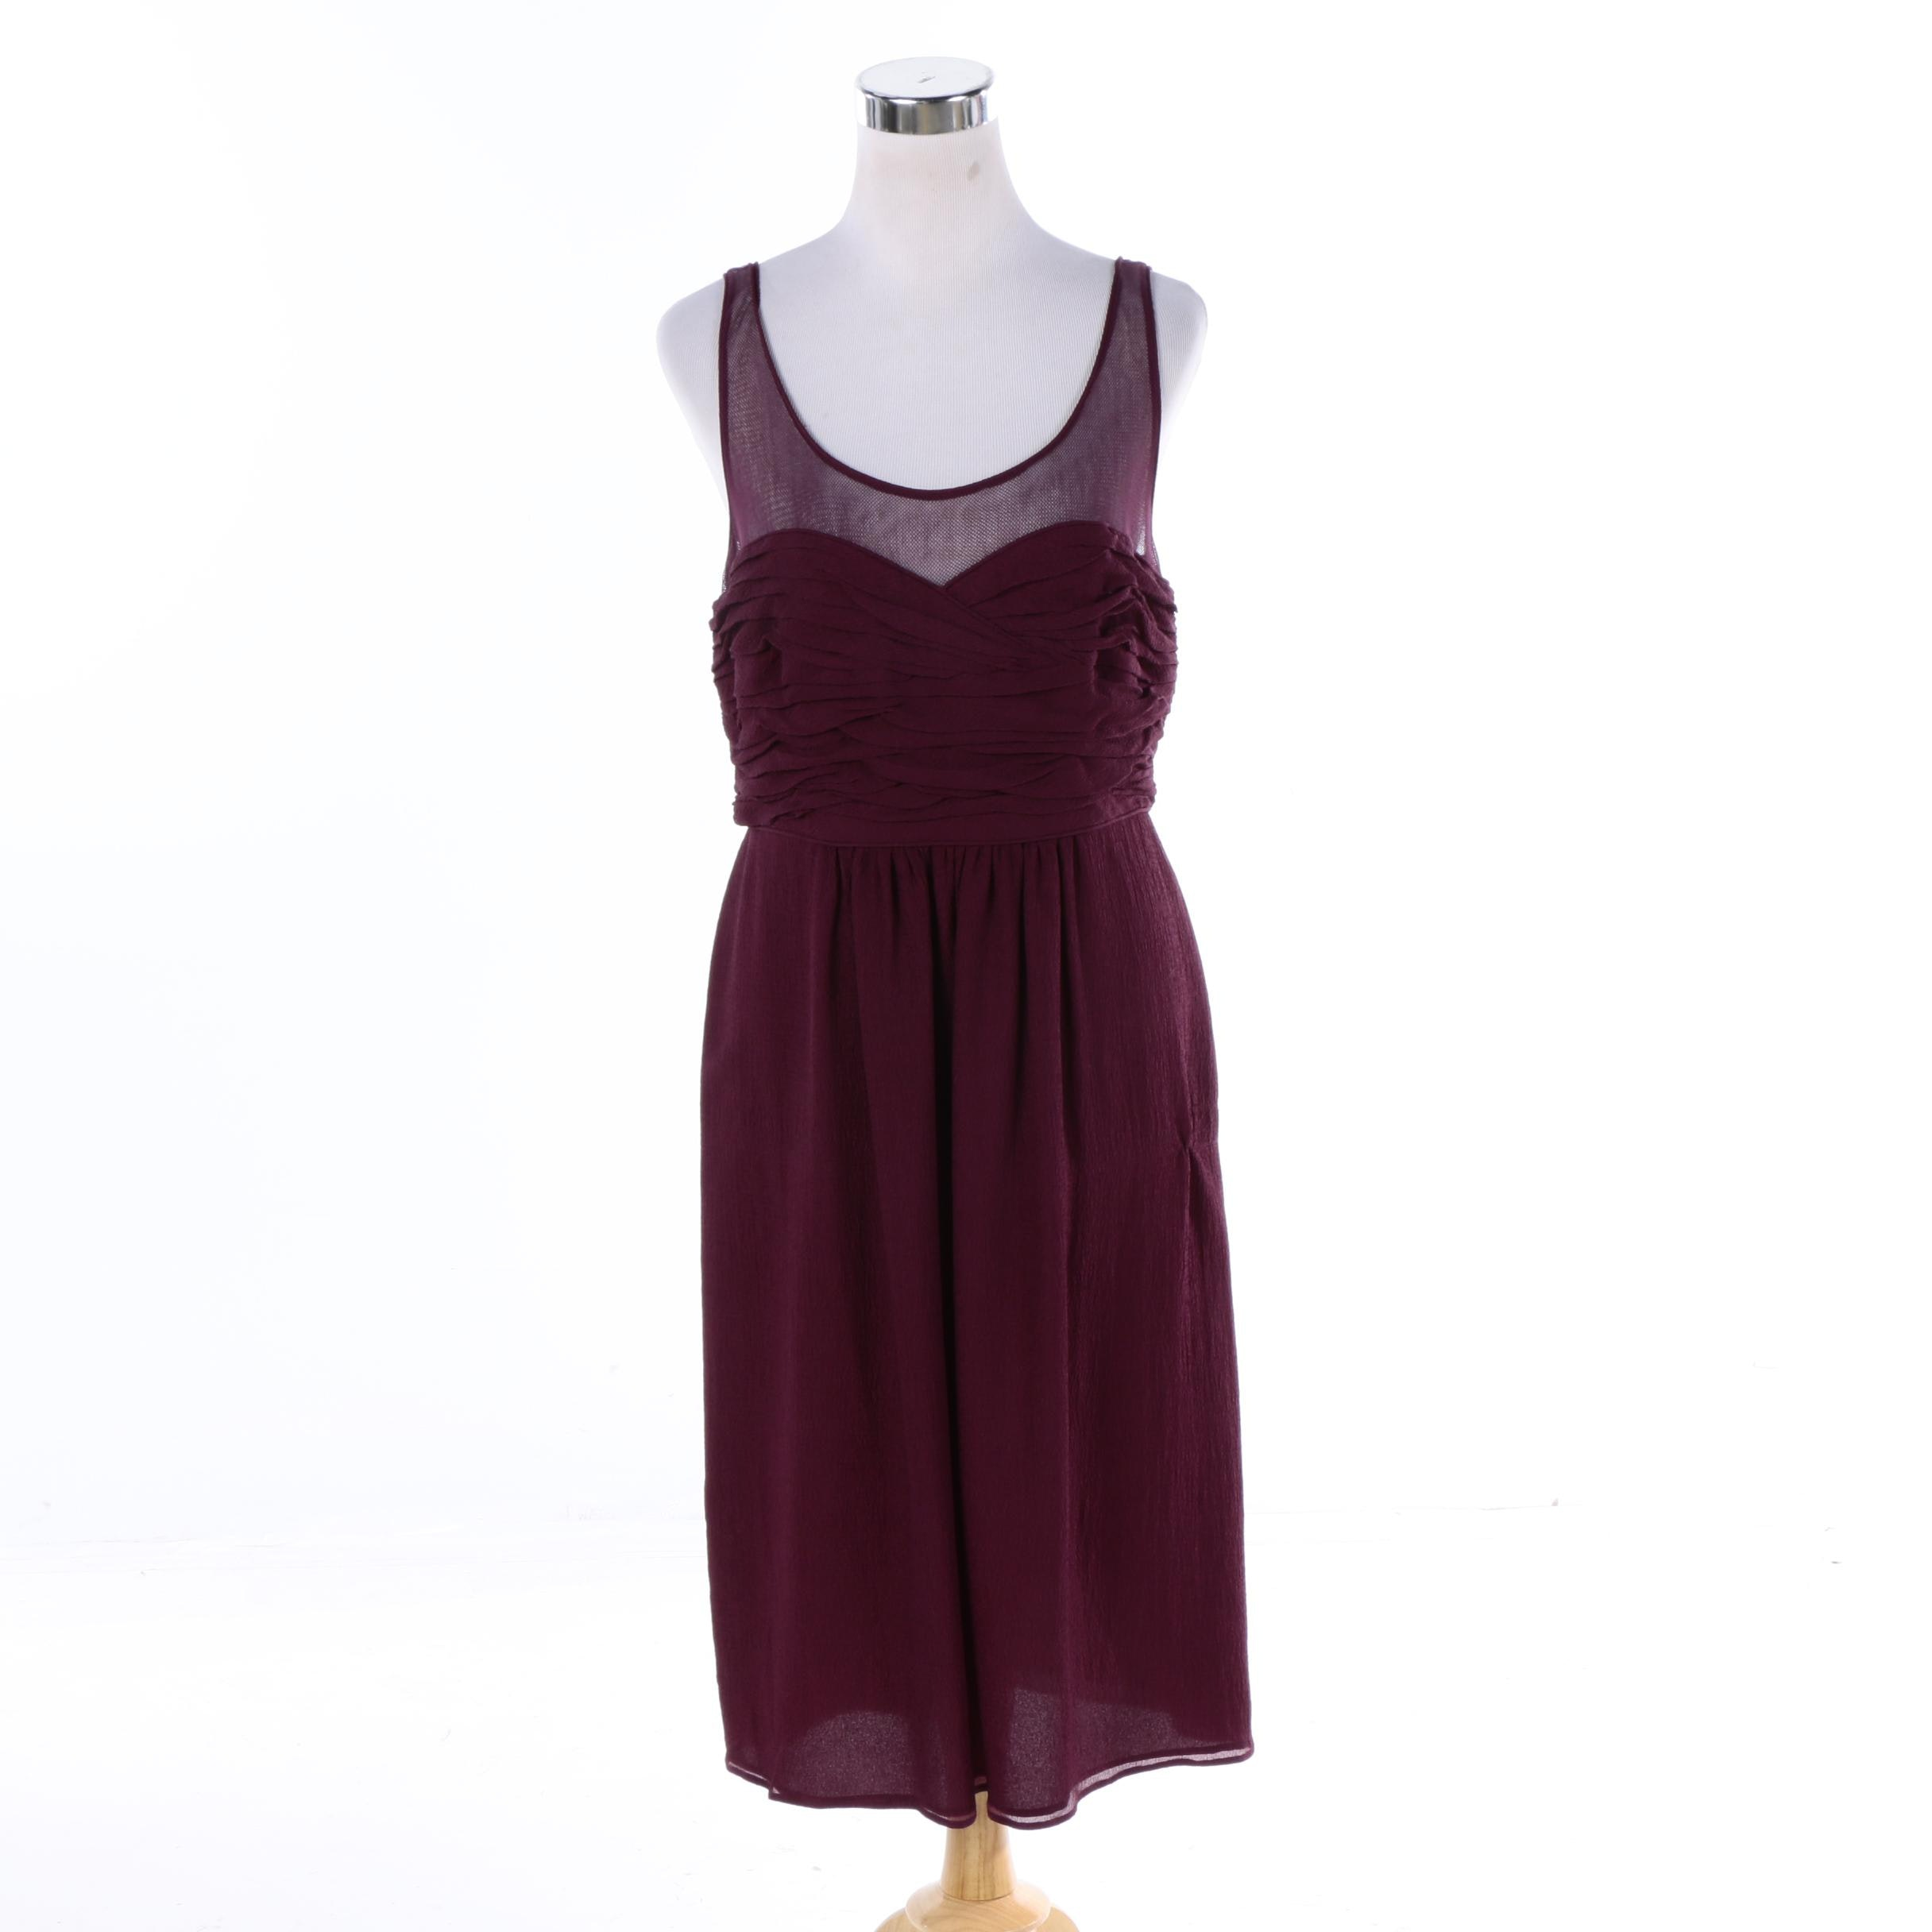 NWT Burberry Magenta Silk Sleeveless Dress